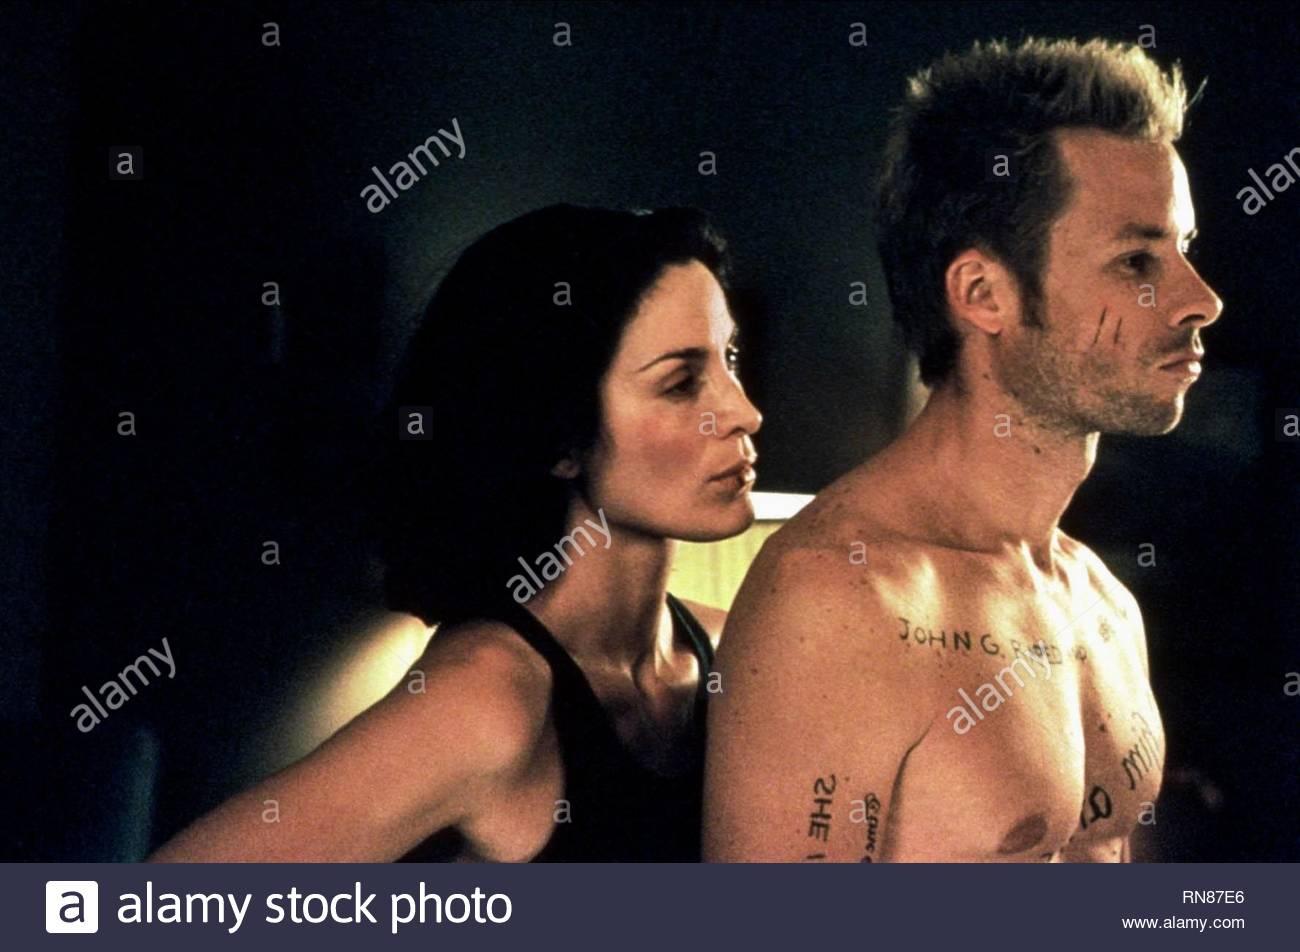 MOSS,PEARCE, MEMENTO, 2000 - Stock Image